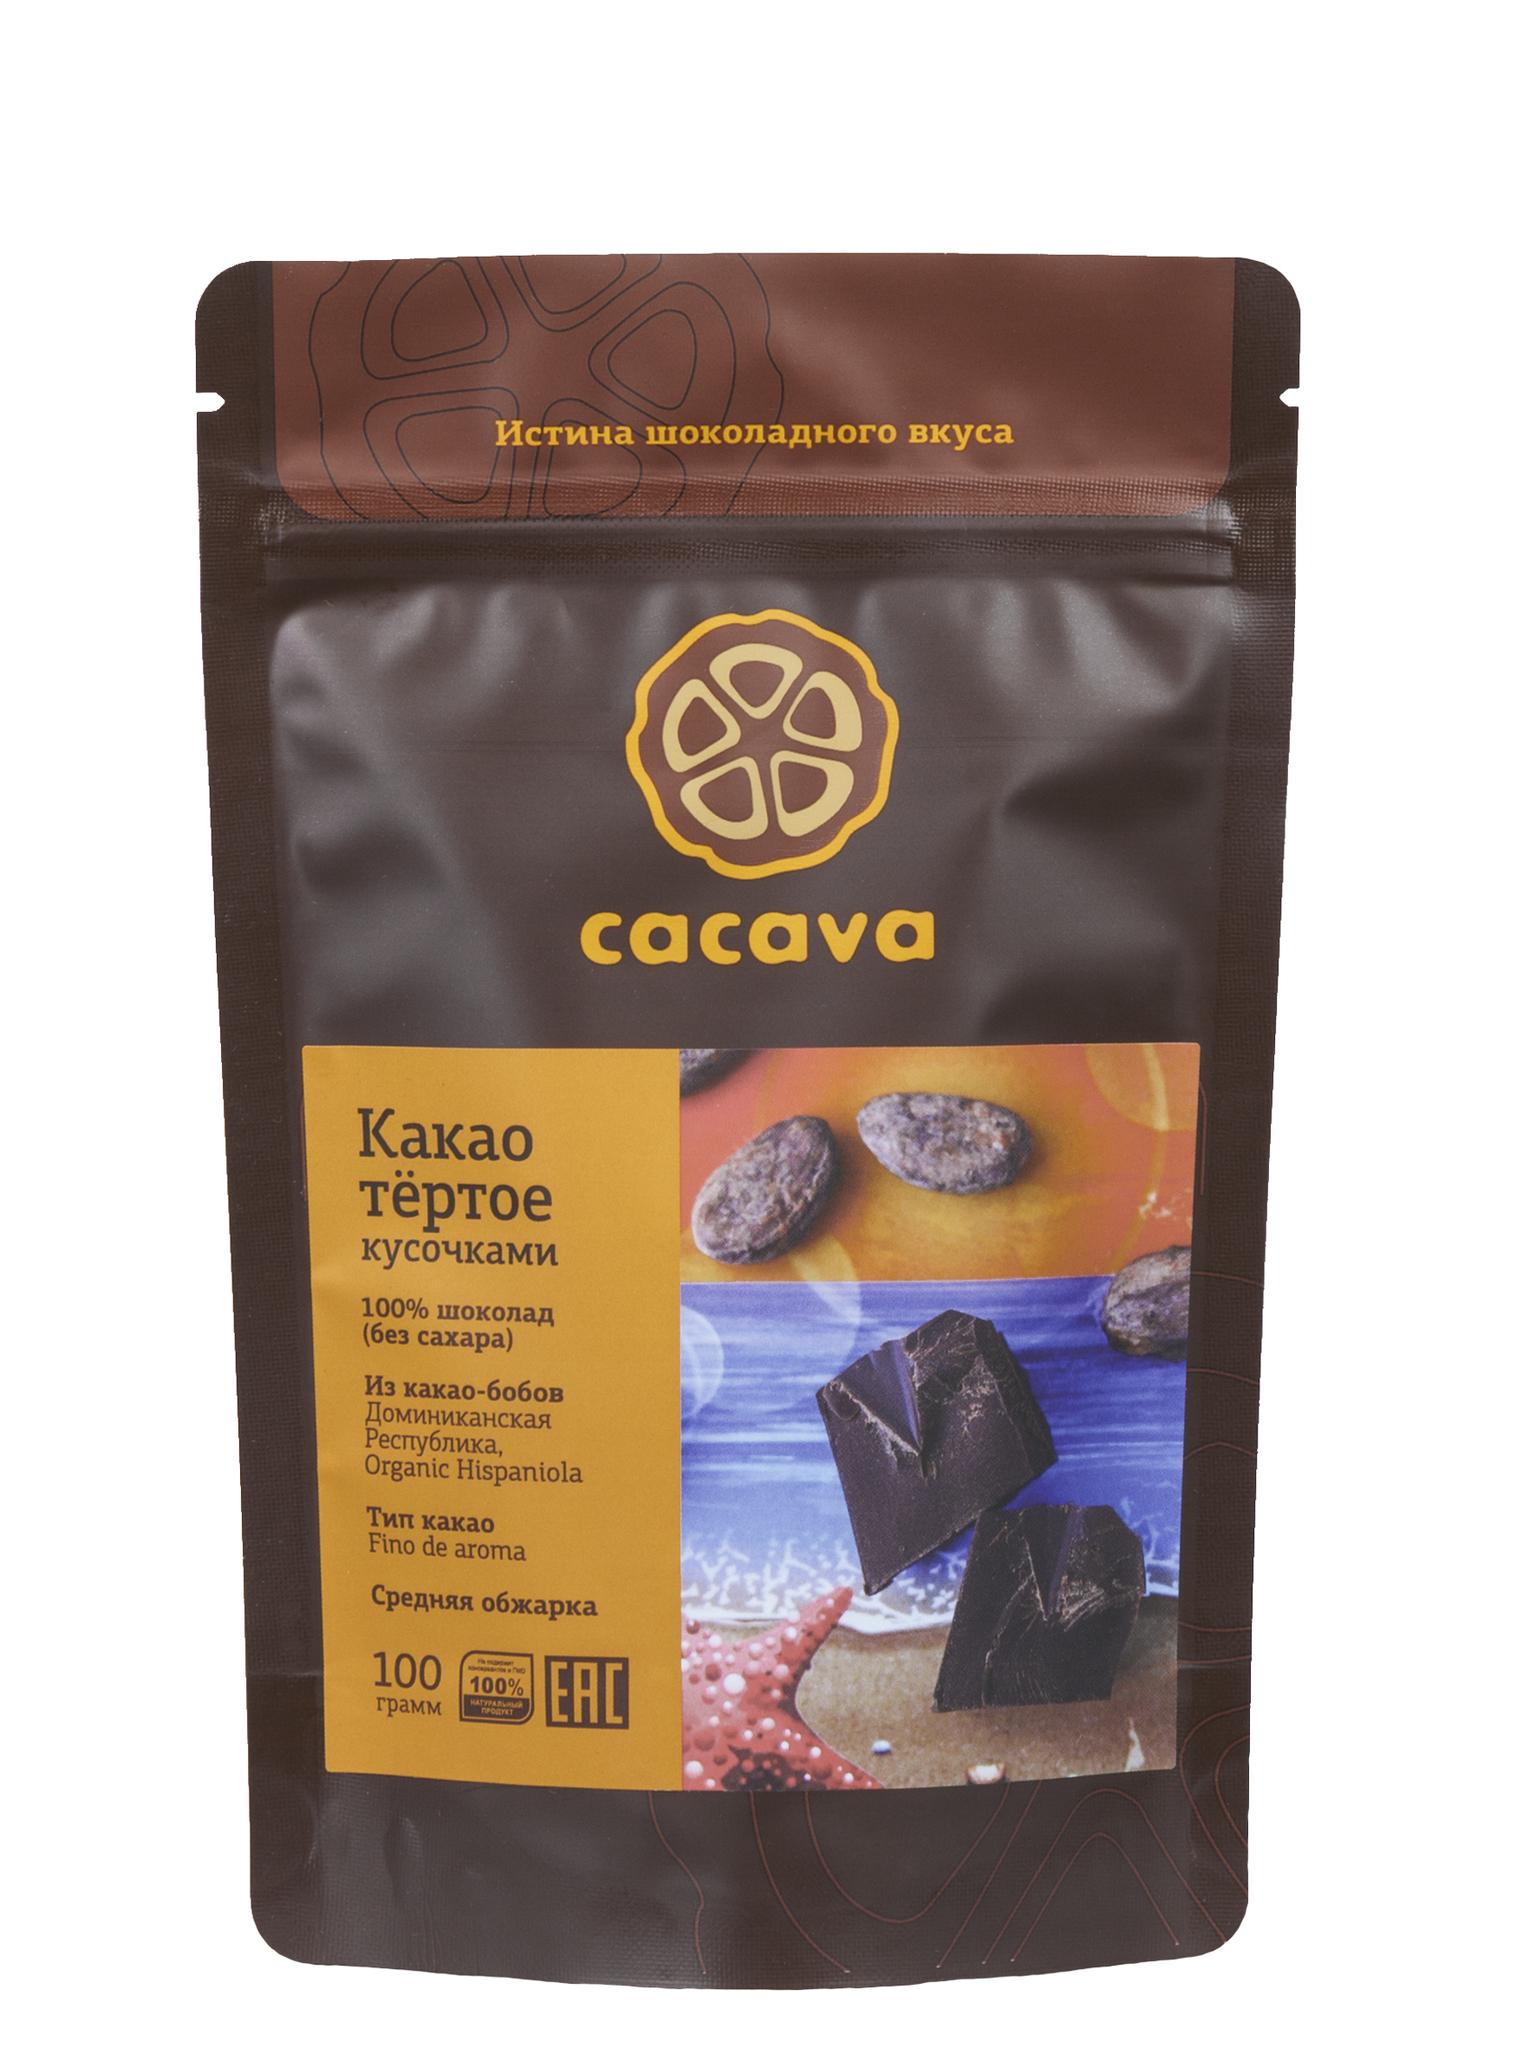 Какао тёртое кусочками (Доминикана), упаковка 100 грамм